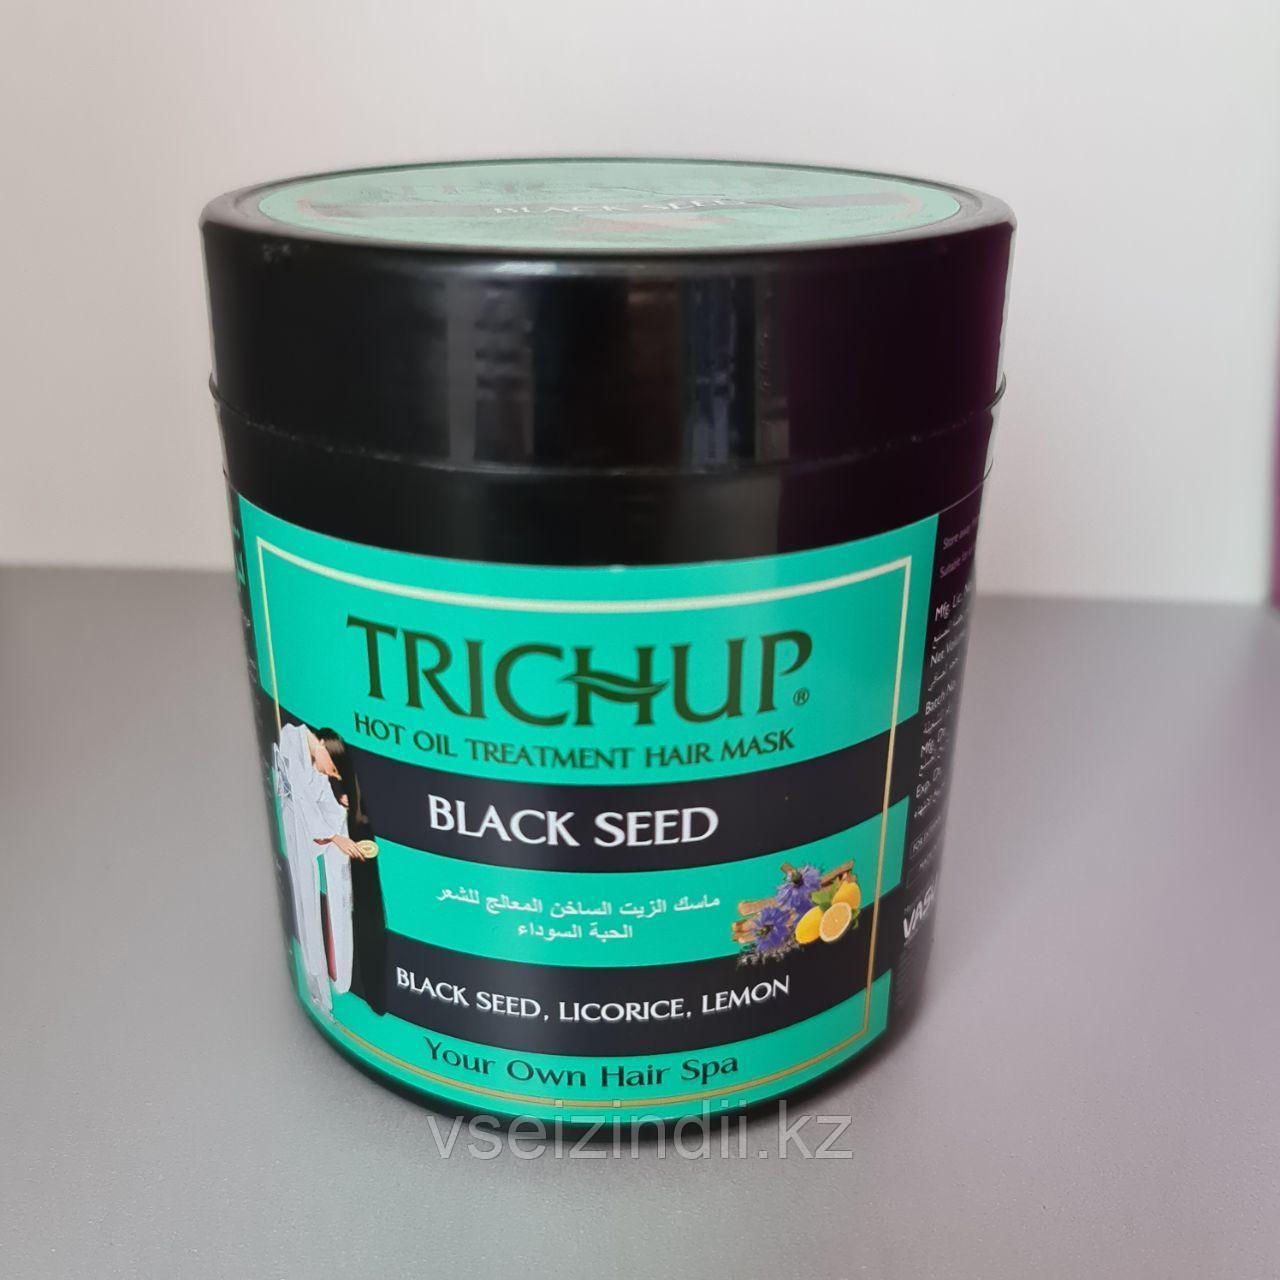 Маска для волос Тричап 500мл с горячим маслом Чёрный Тмин (Trichup Hot Oil Treatment hair mask Black Seed)